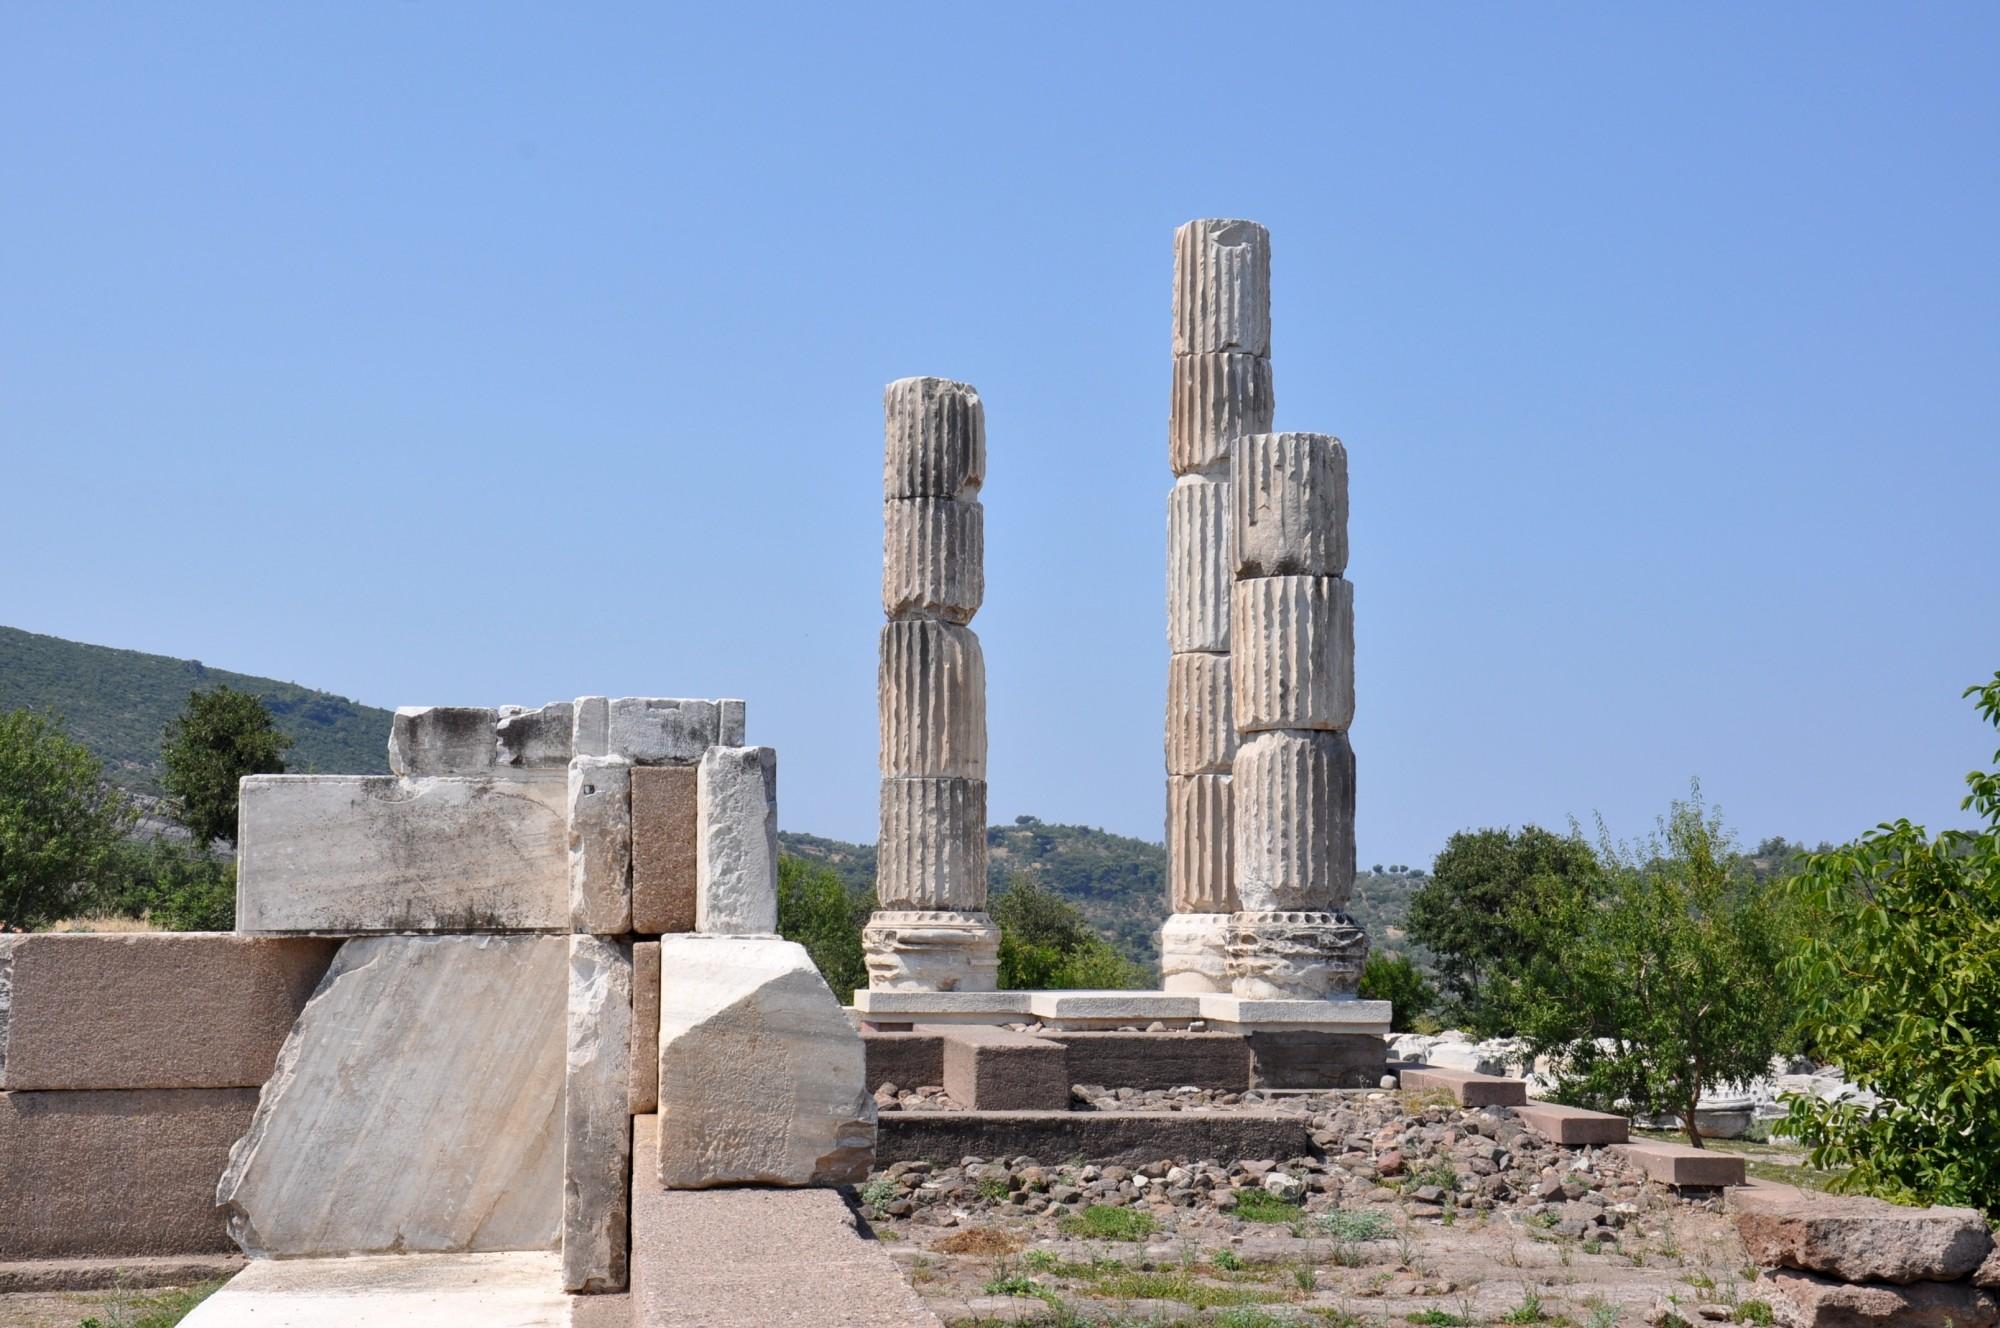 The Temple of Apollo in Gülpınar